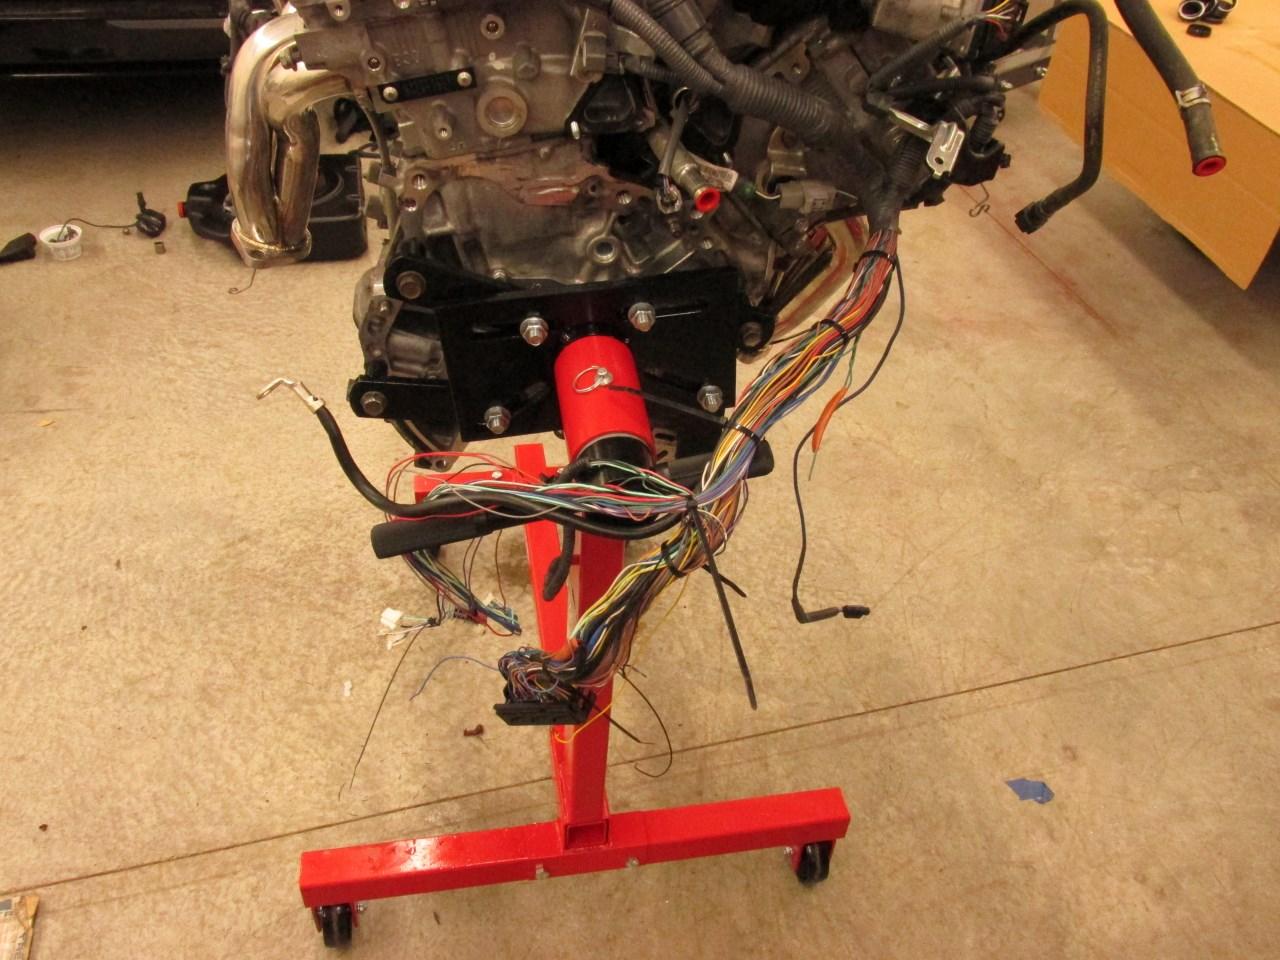 hight resolution of  cavalier wilhelm raceworks llc 2gr fe v6 swap on 300zx wiring harness 4runner aw11